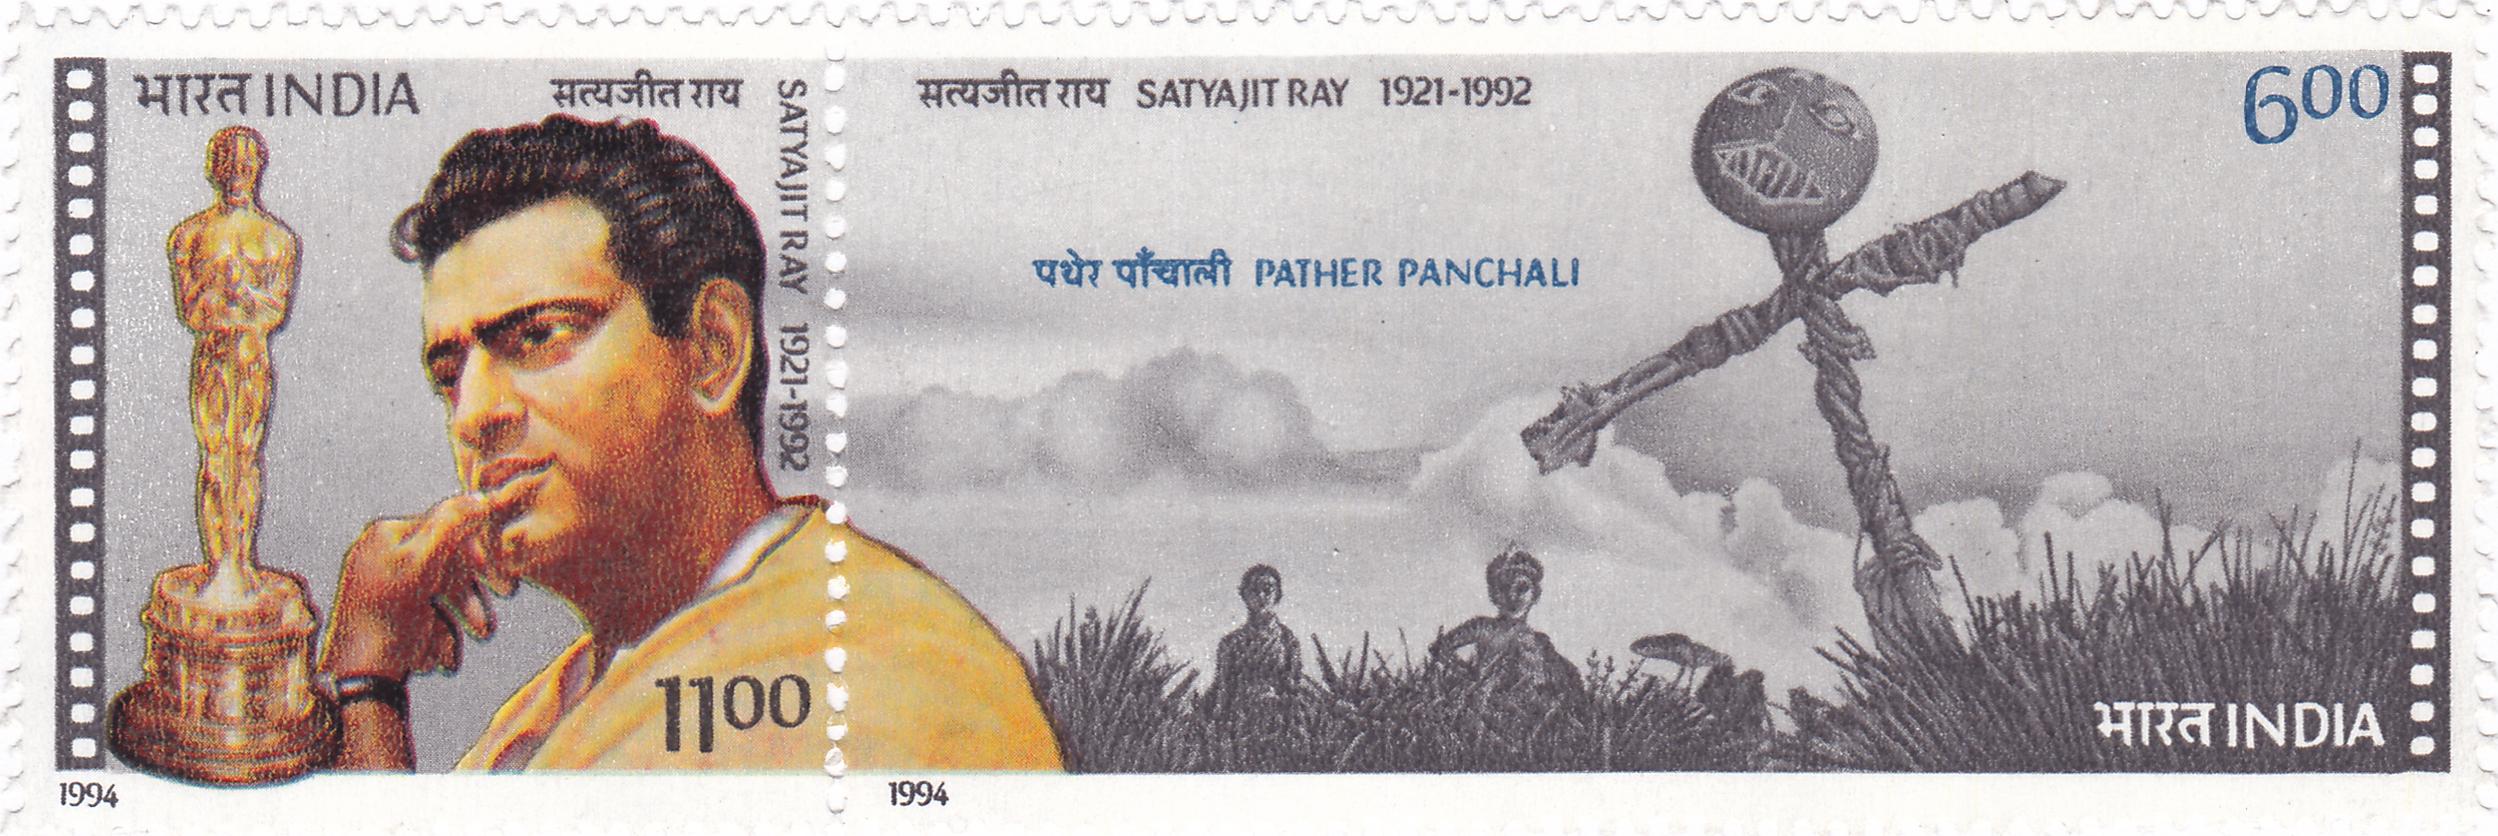 satyajit-ray-pather-panchali-sculpture